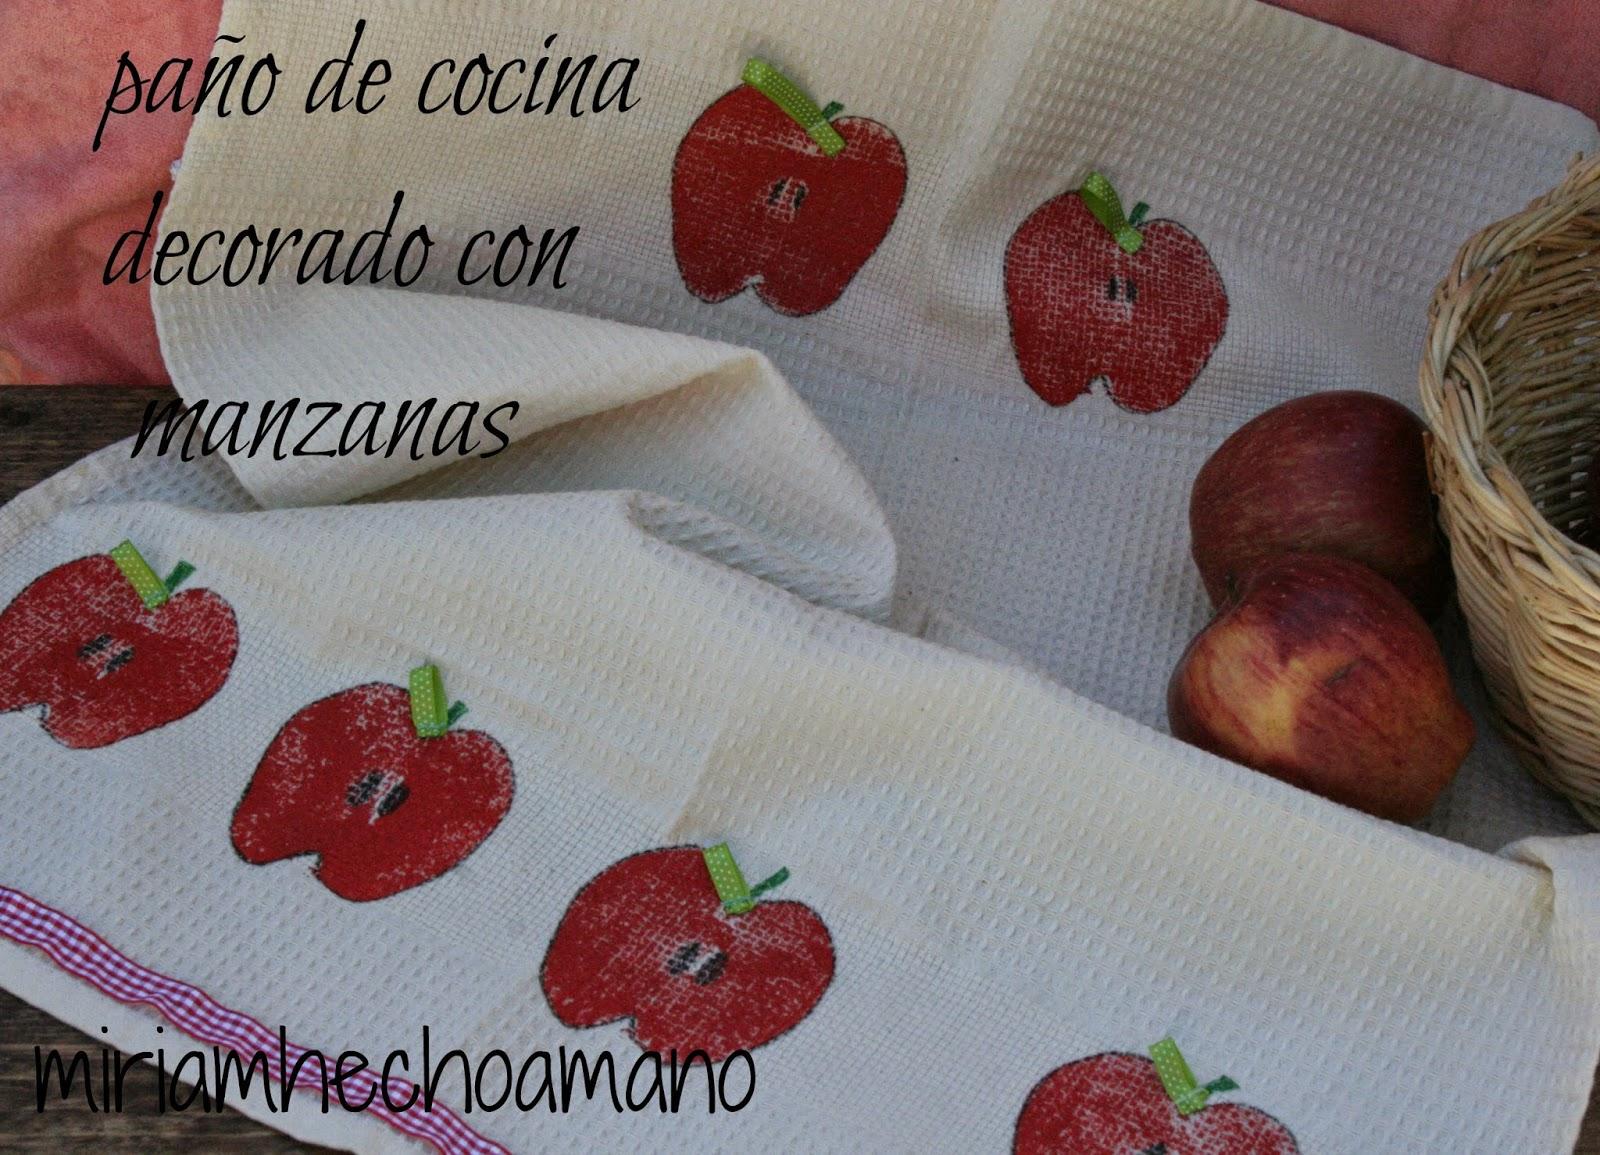 miriam hecho a mano: PAÑO DE COCINA DECORADO CON MANZANAS. RETO ...